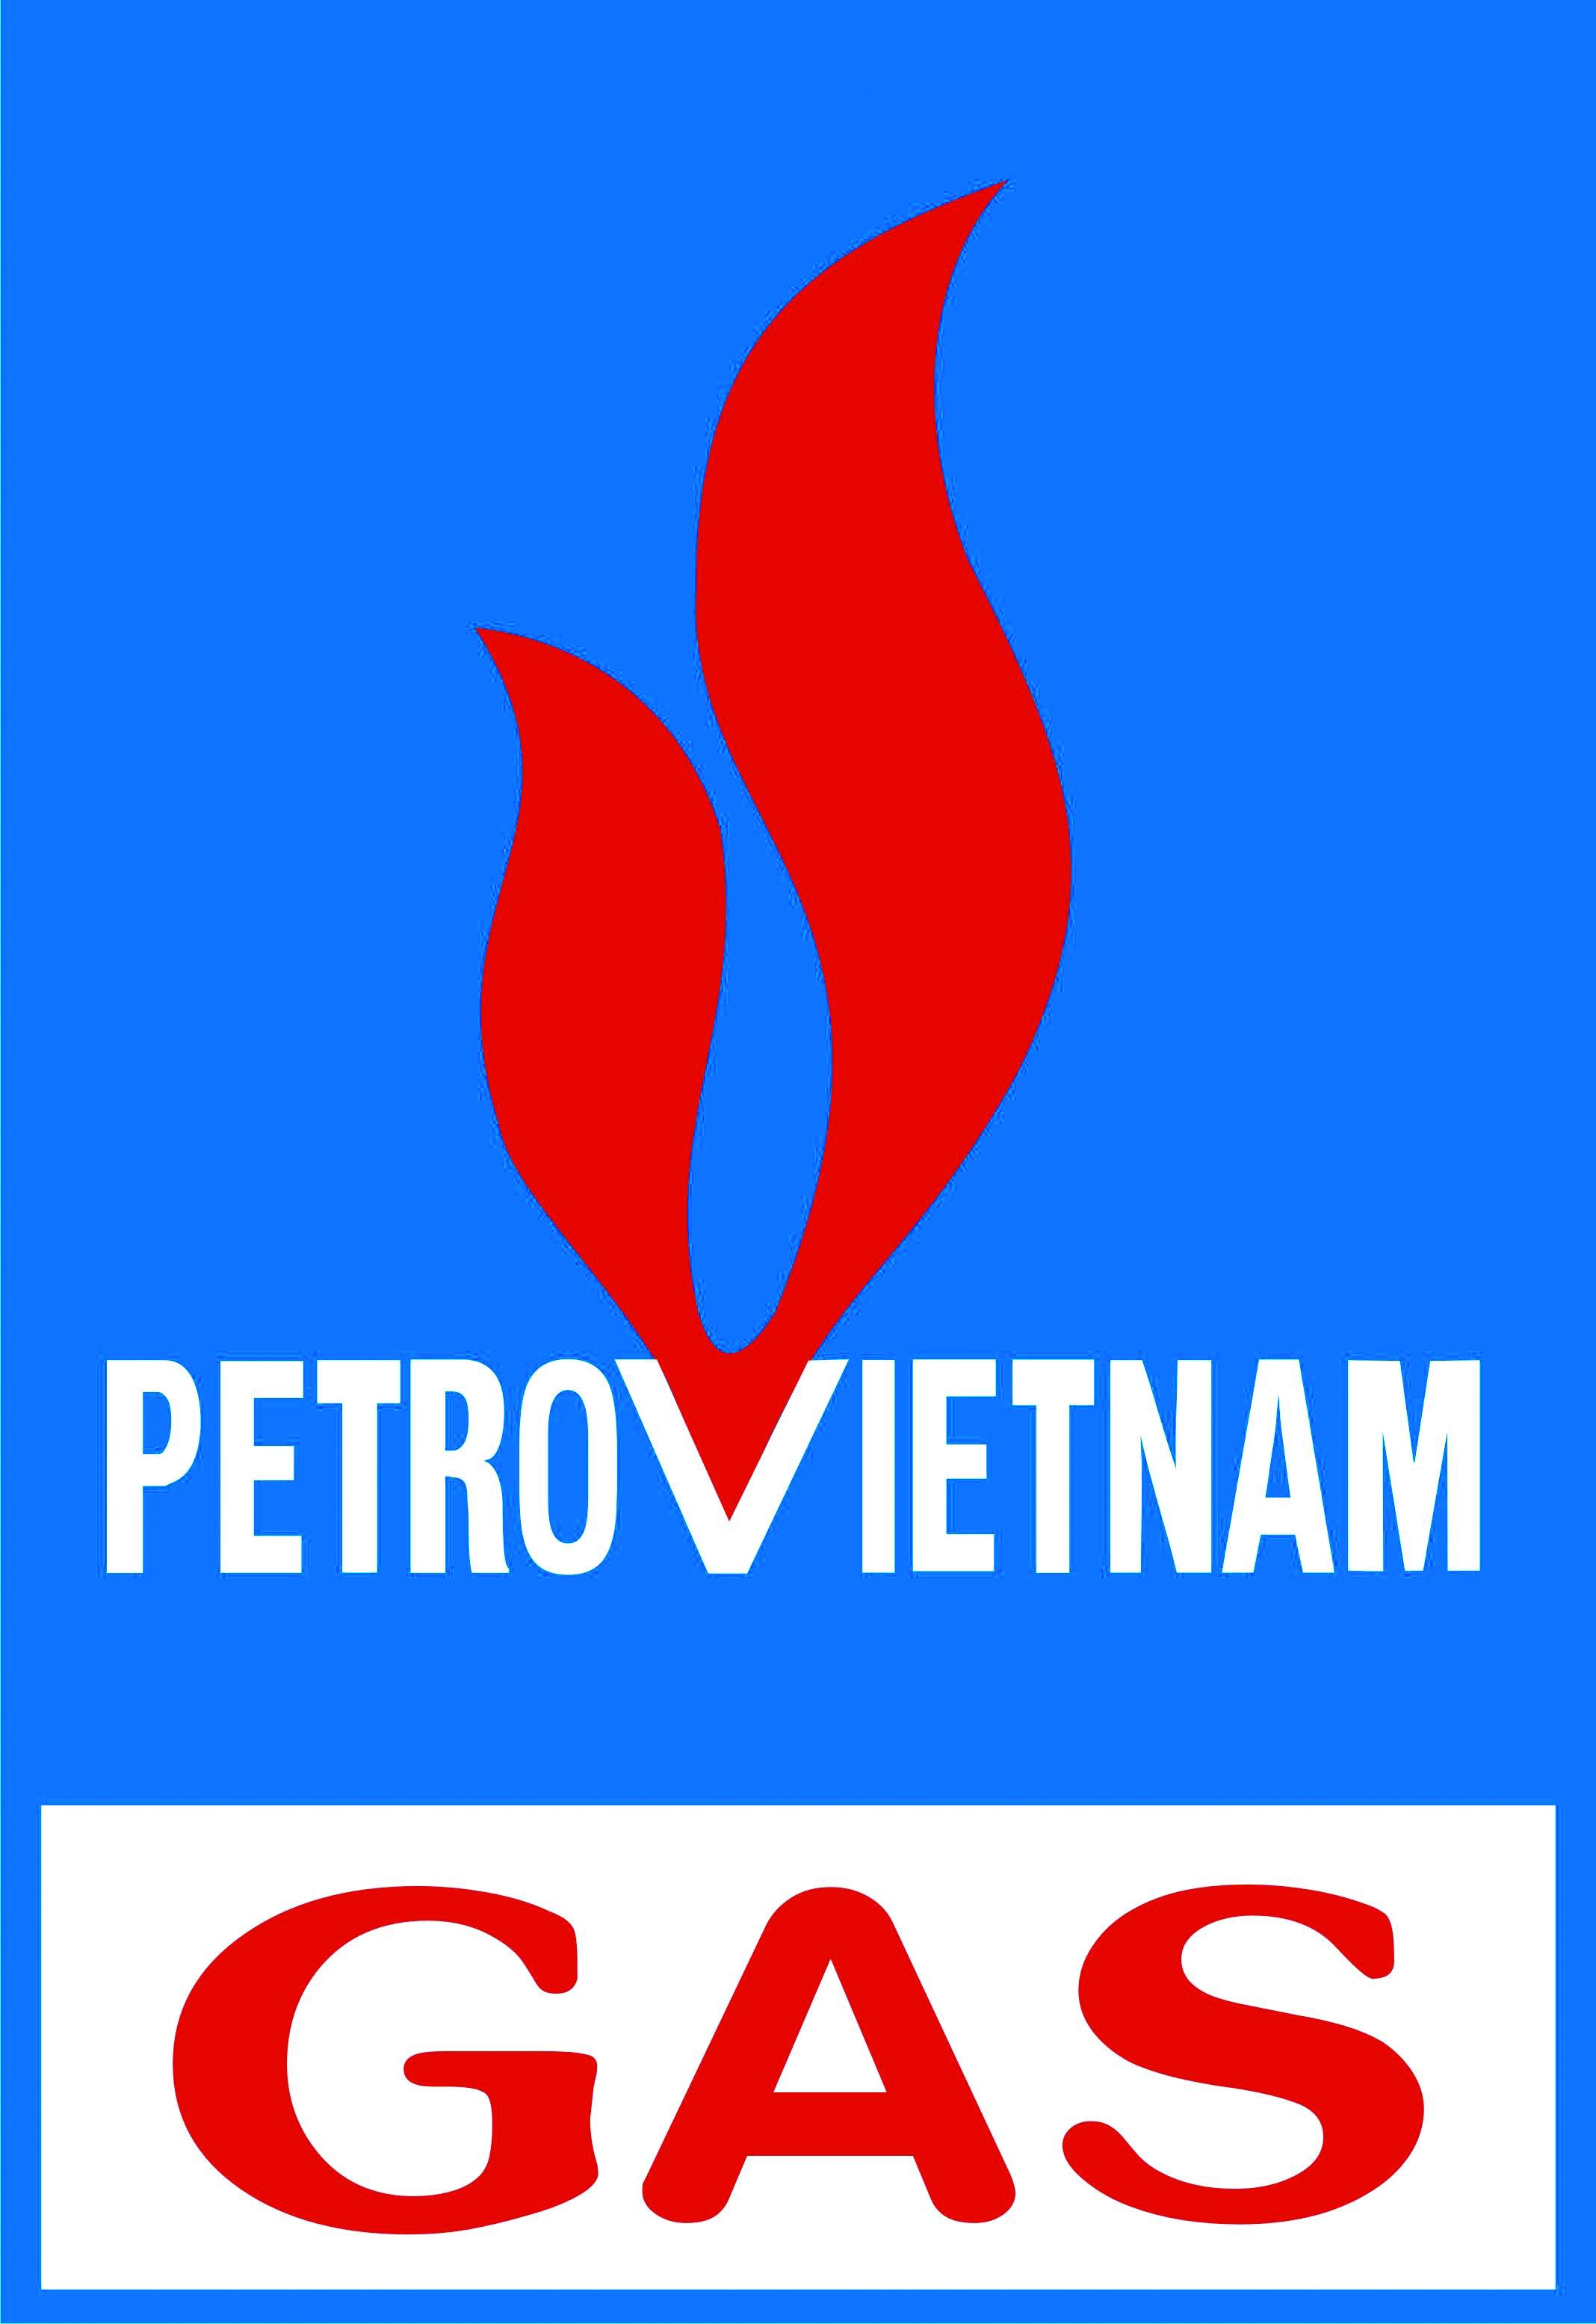 Pv Vungtau Gas - Petrovietnam, Transparent background PNG HD thumbnail